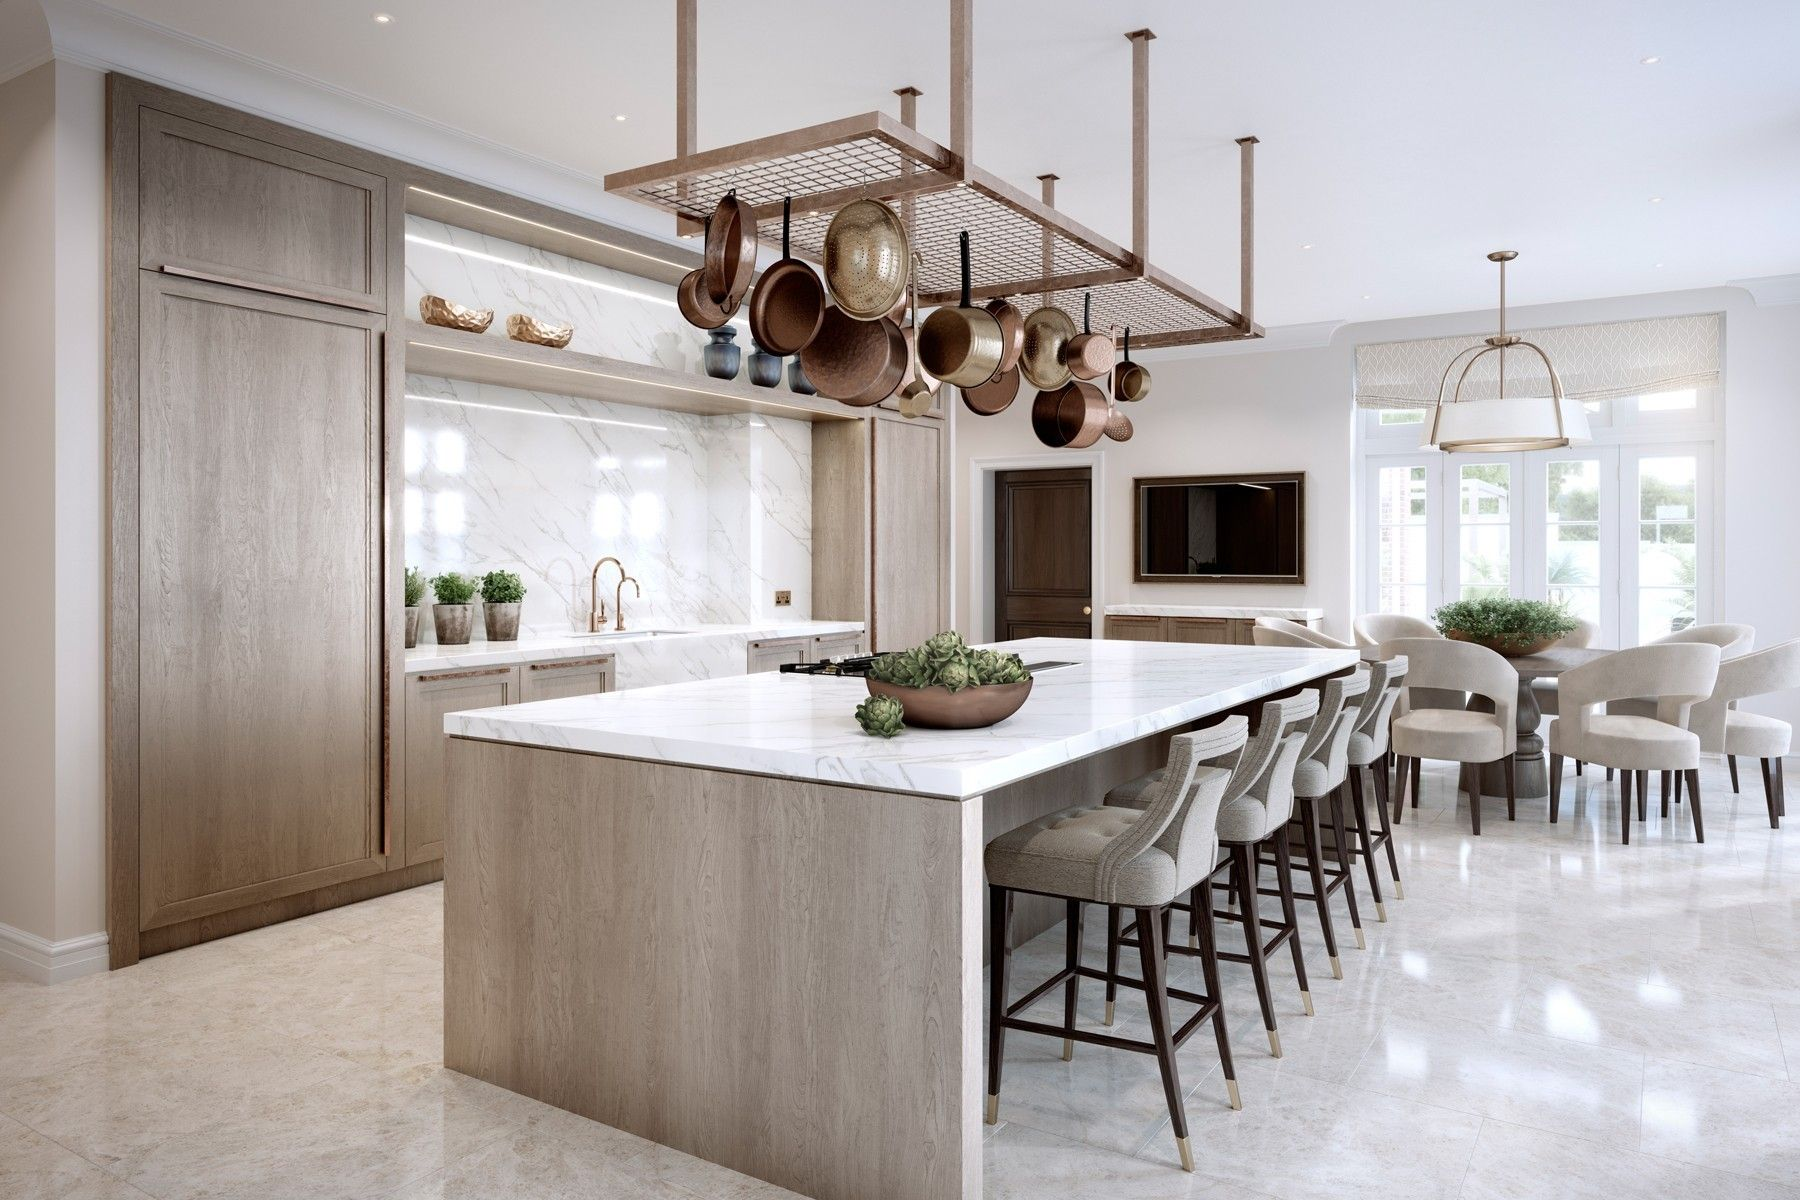 Kitchen seating ideas   Surrey Family Home, Luxury ...